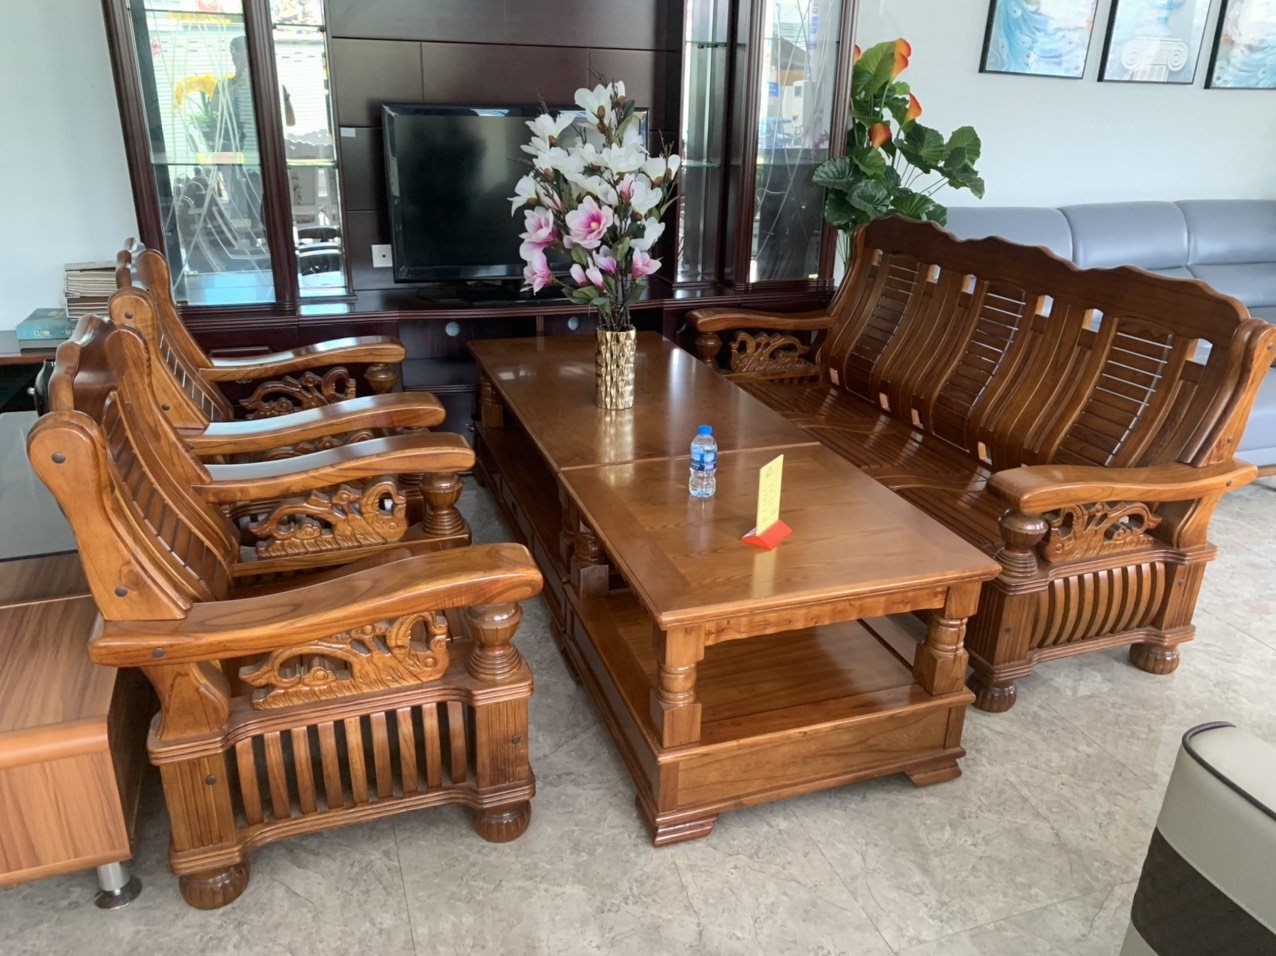 sofa gỗ xoan đào